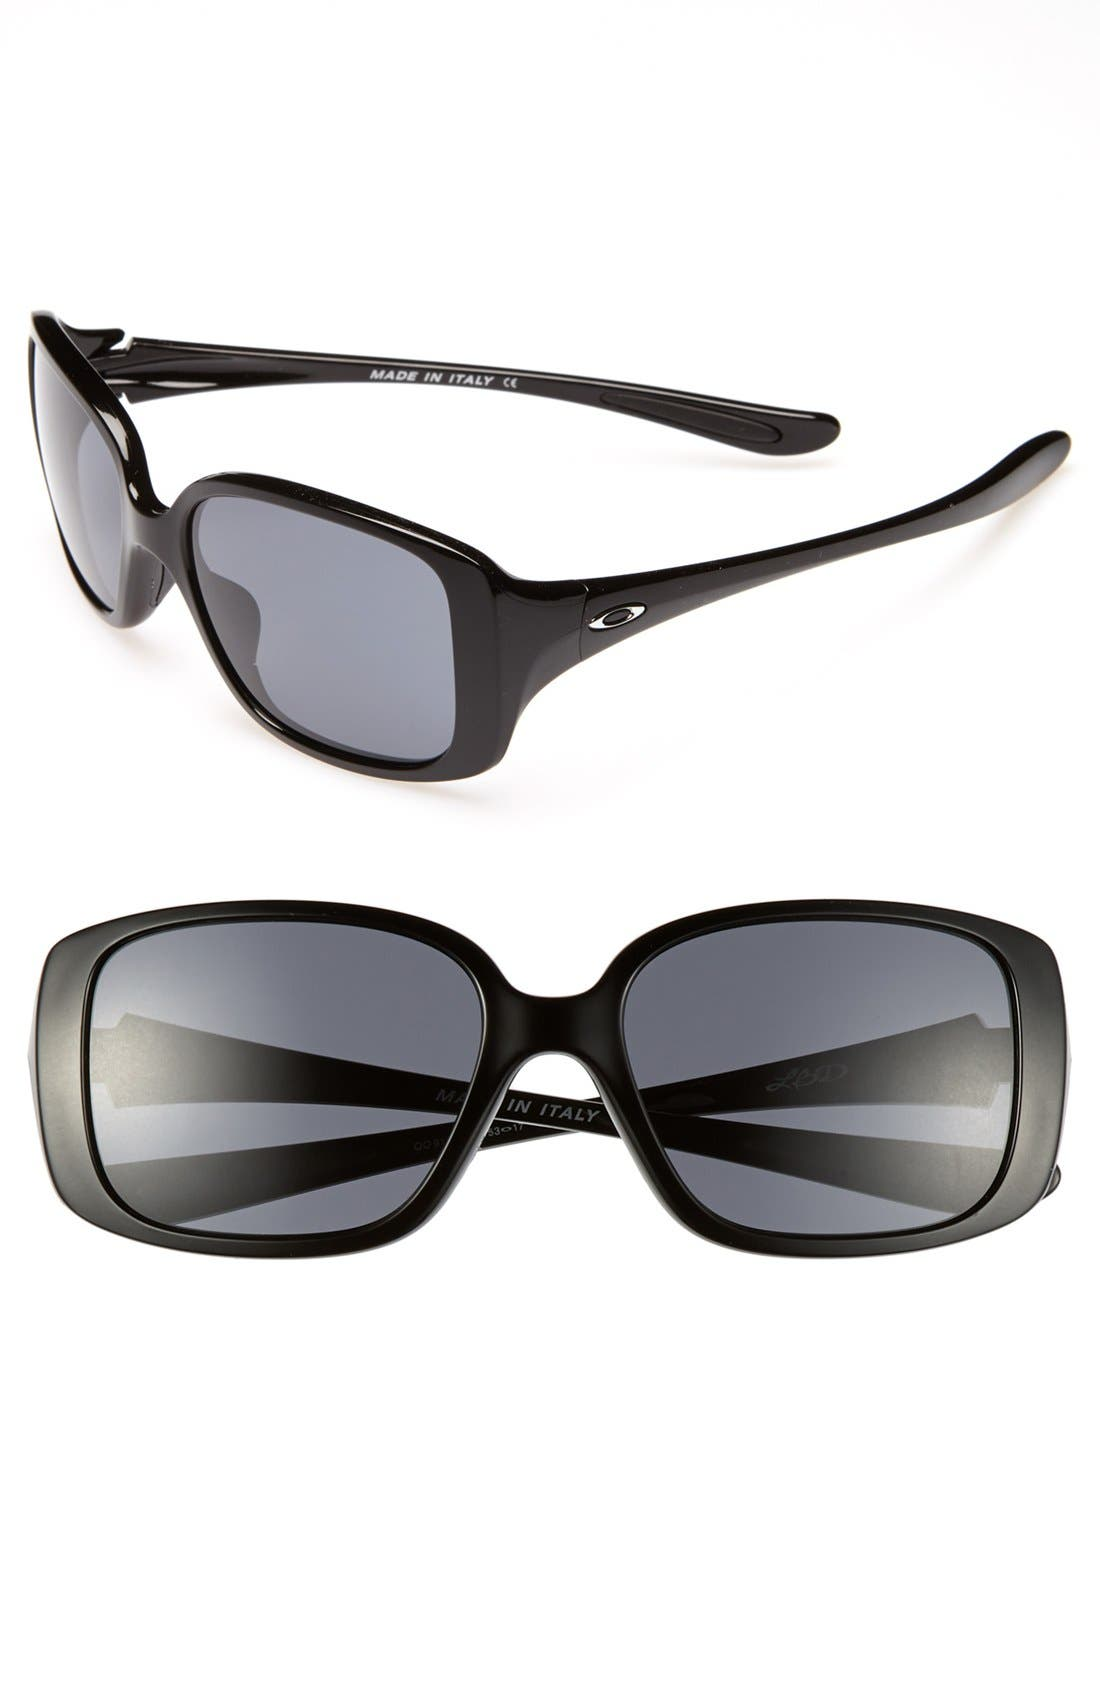 Alternate Image 1 Selected - Oakley 'LBD' 53mm Sunglasses